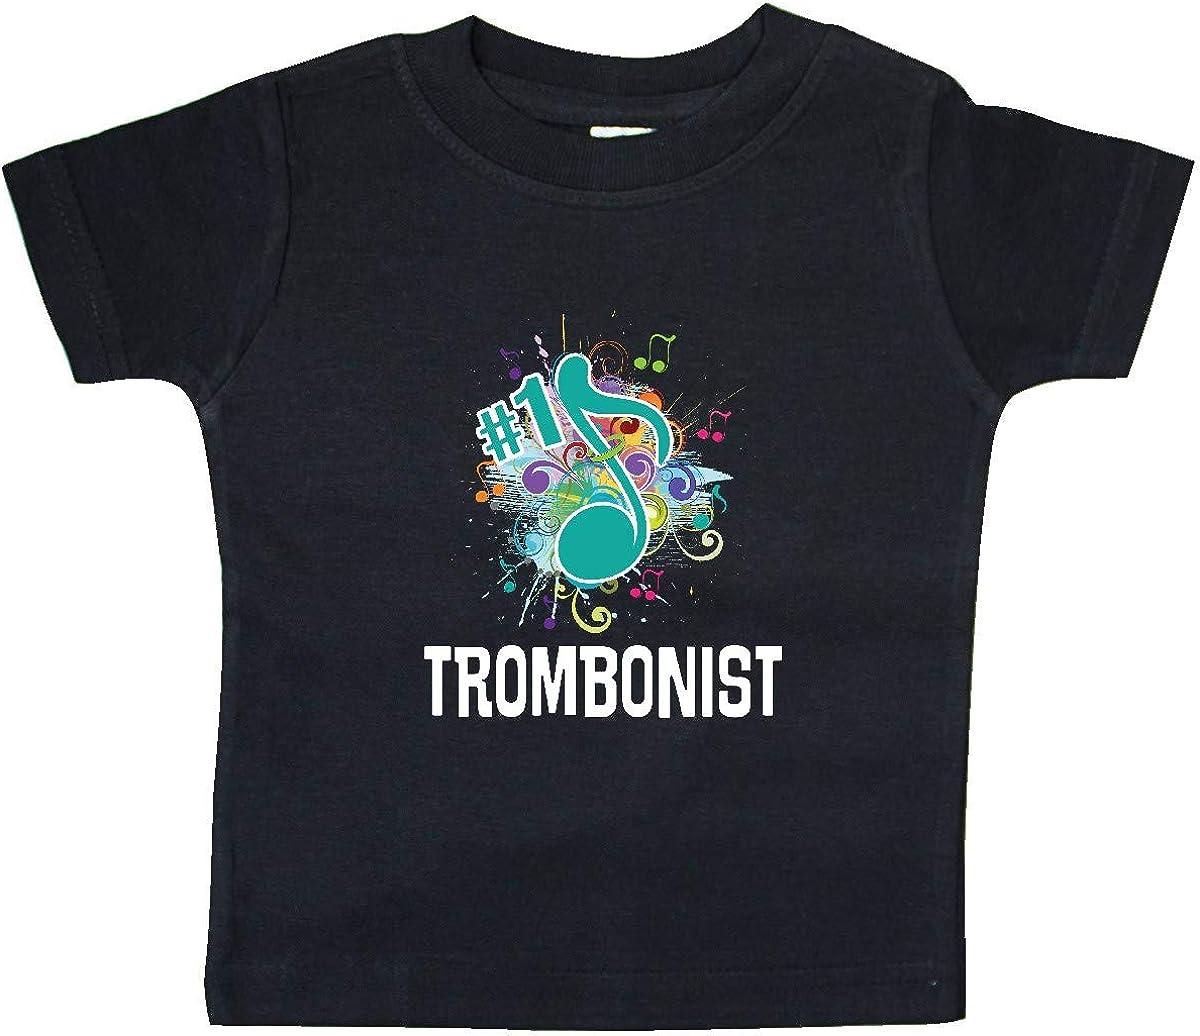 inktastic Trombone Music Gift Number 1 Trombonist Baby T-Shirt